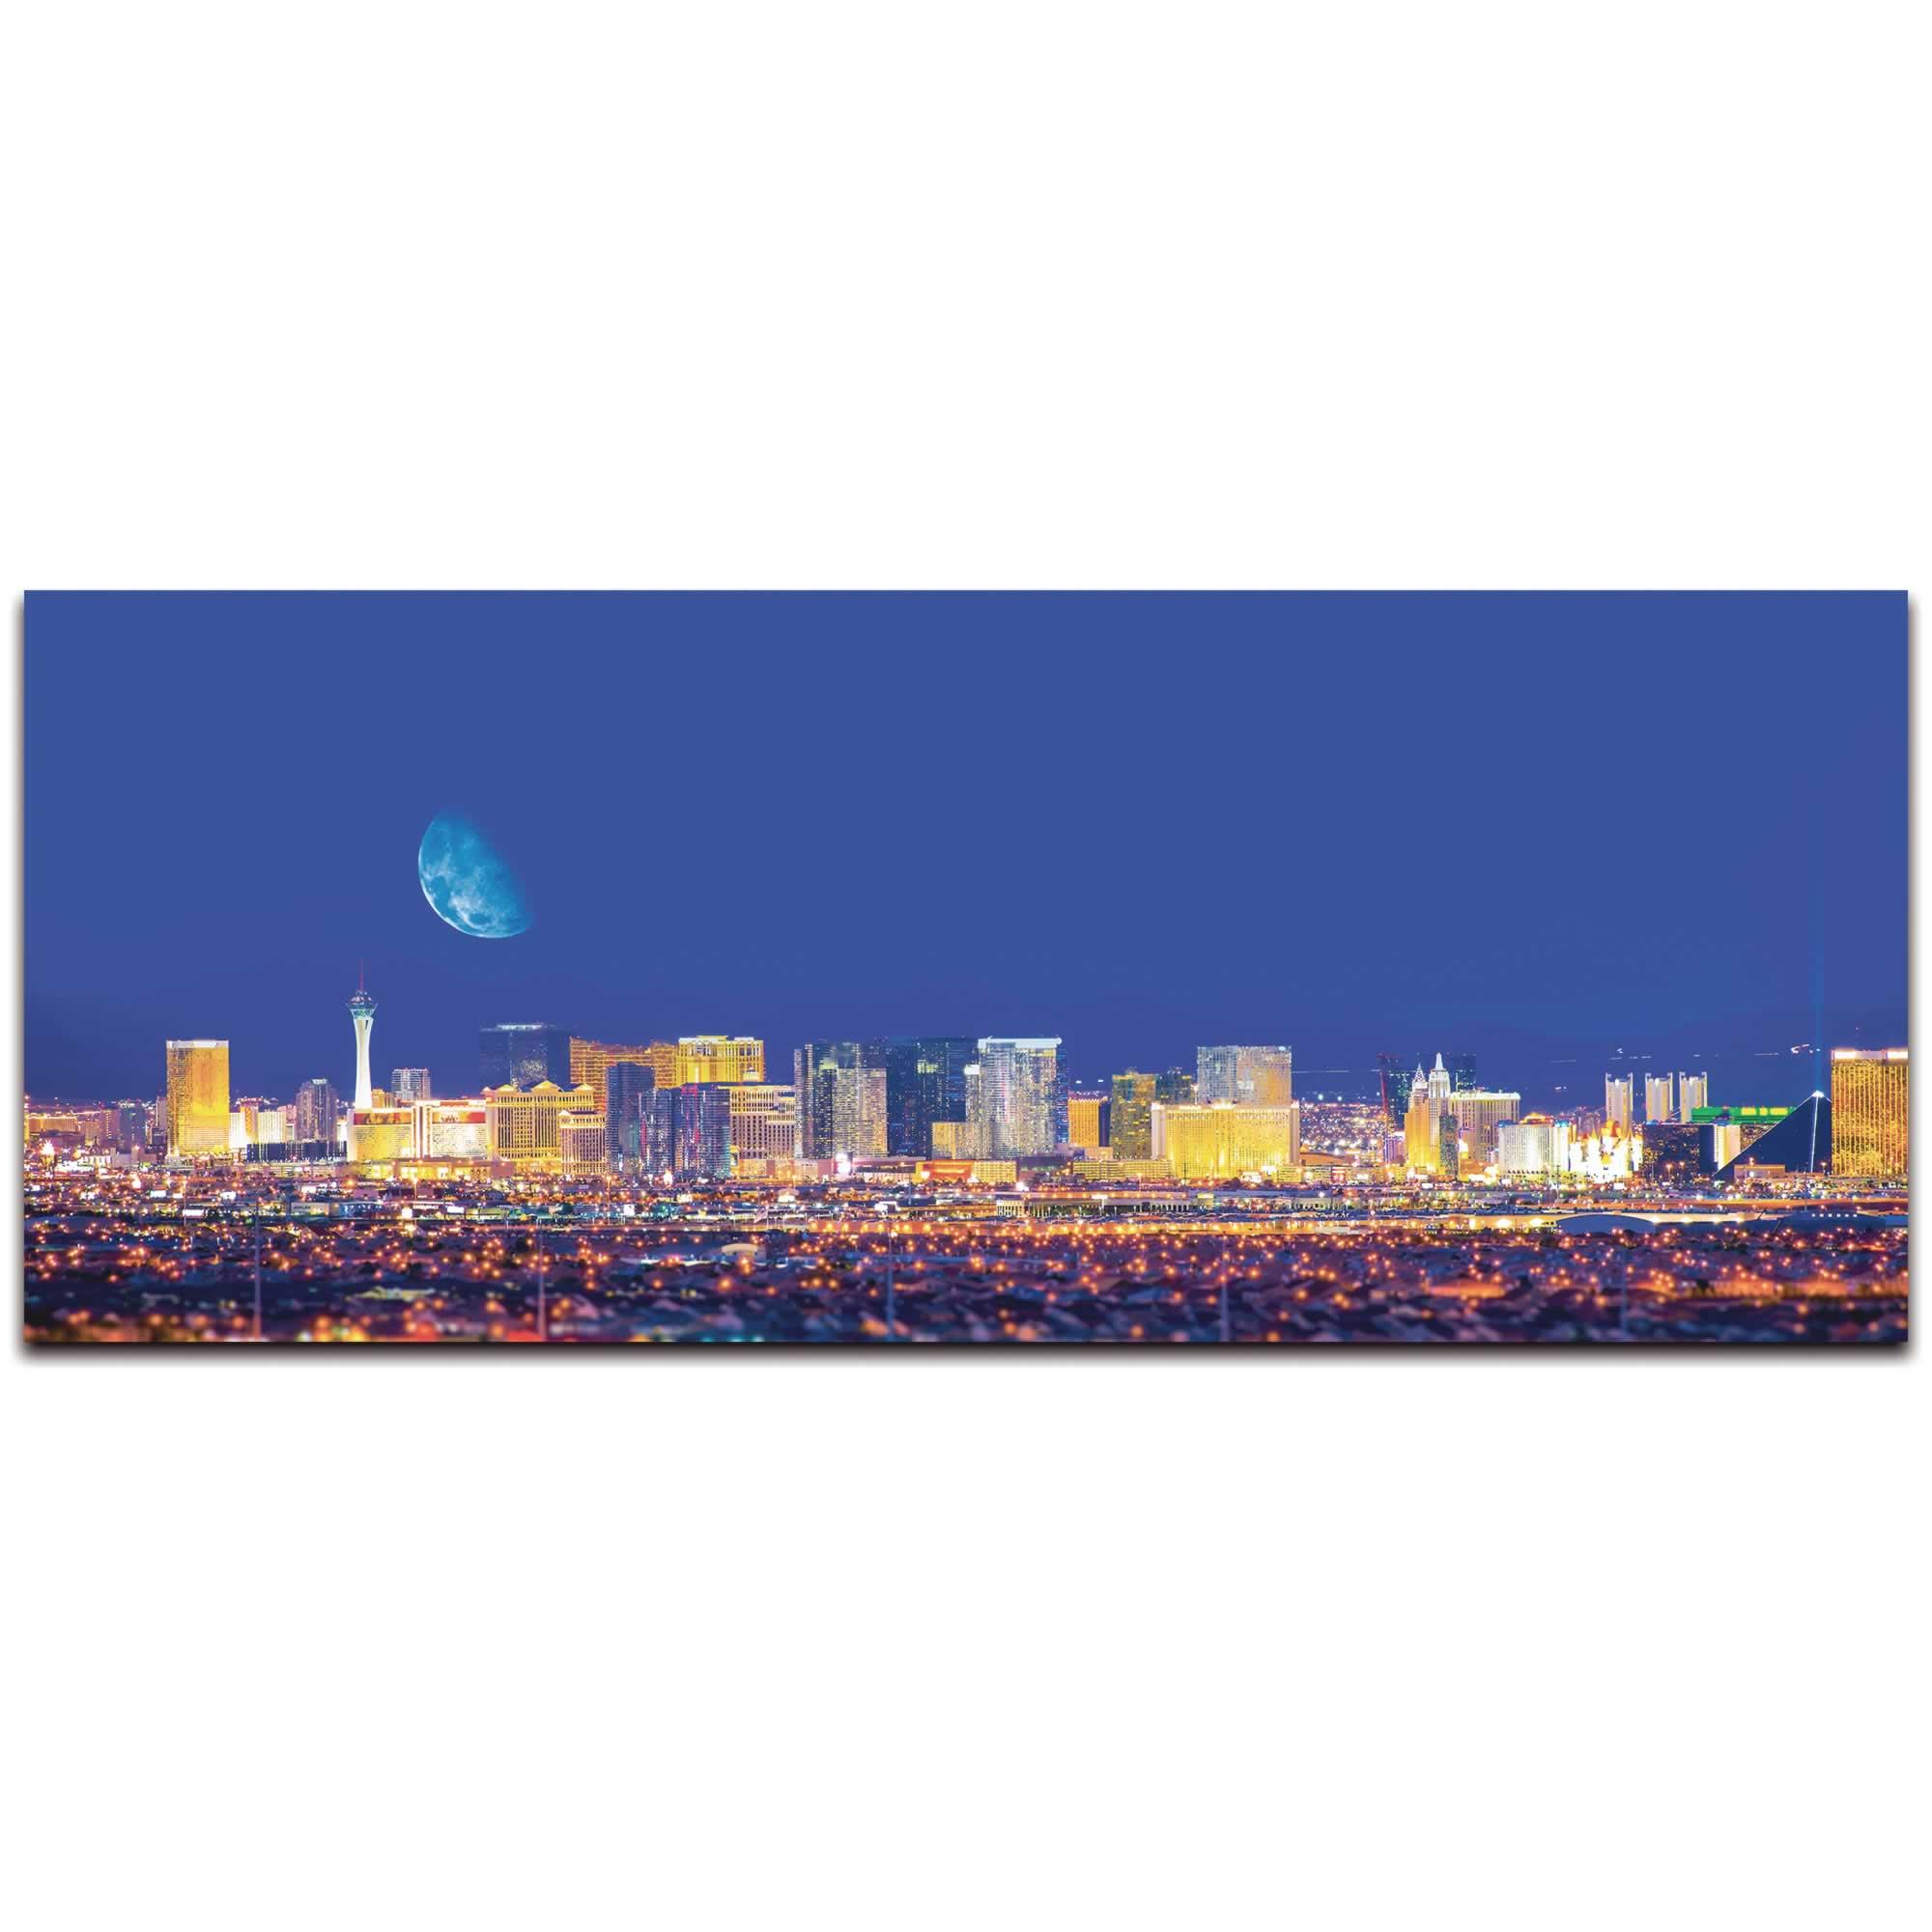 Las Vegas City Skyline - Urban Modern Art, Designer Home Decor, Cityscape Wall Artwork, Trendy Contemporary Art - Alternate View 2